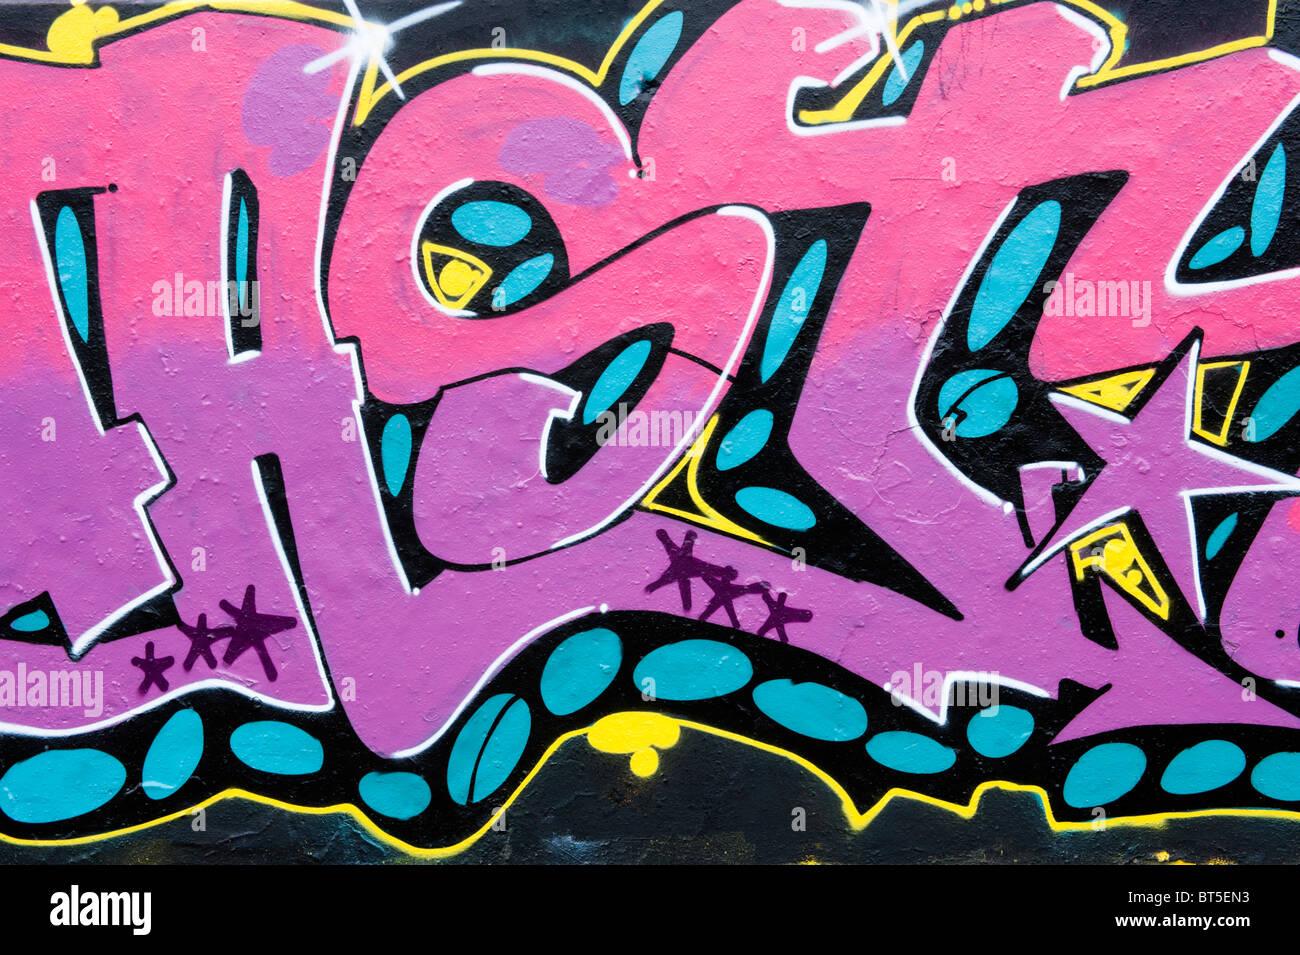 rosa graffiti schriftzug stockfoto bild 32083439 alamy. Black Bedroom Furniture Sets. Home Design Ideas